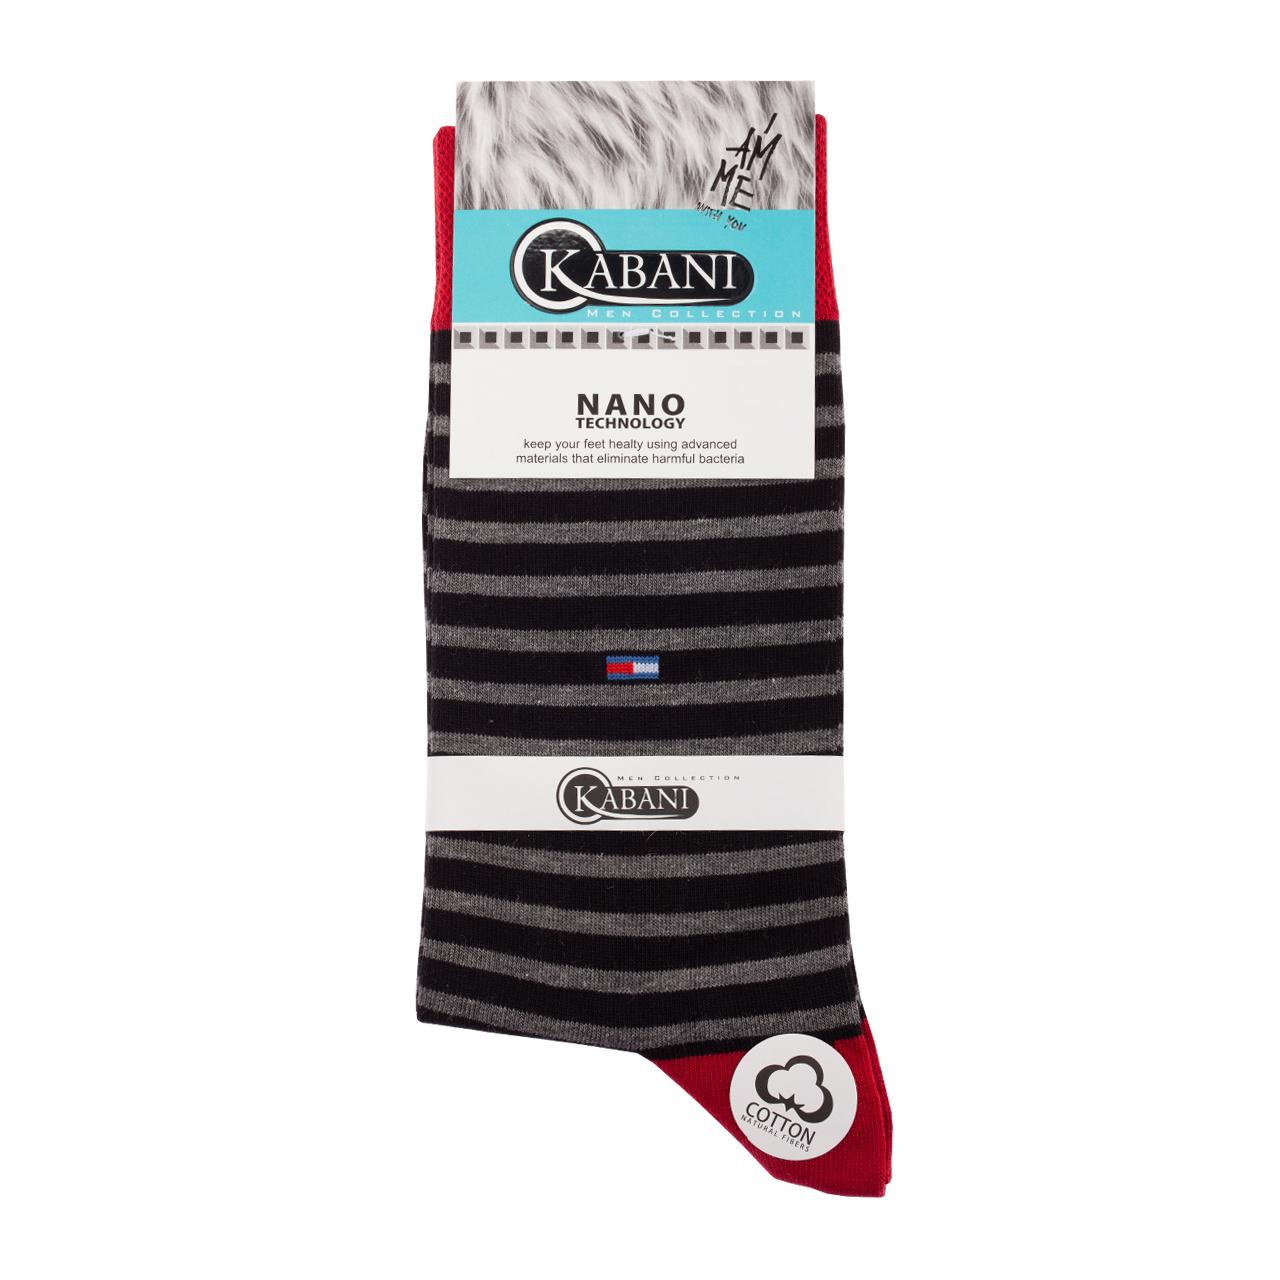 جوراب مردانه کابانی مدل T2020